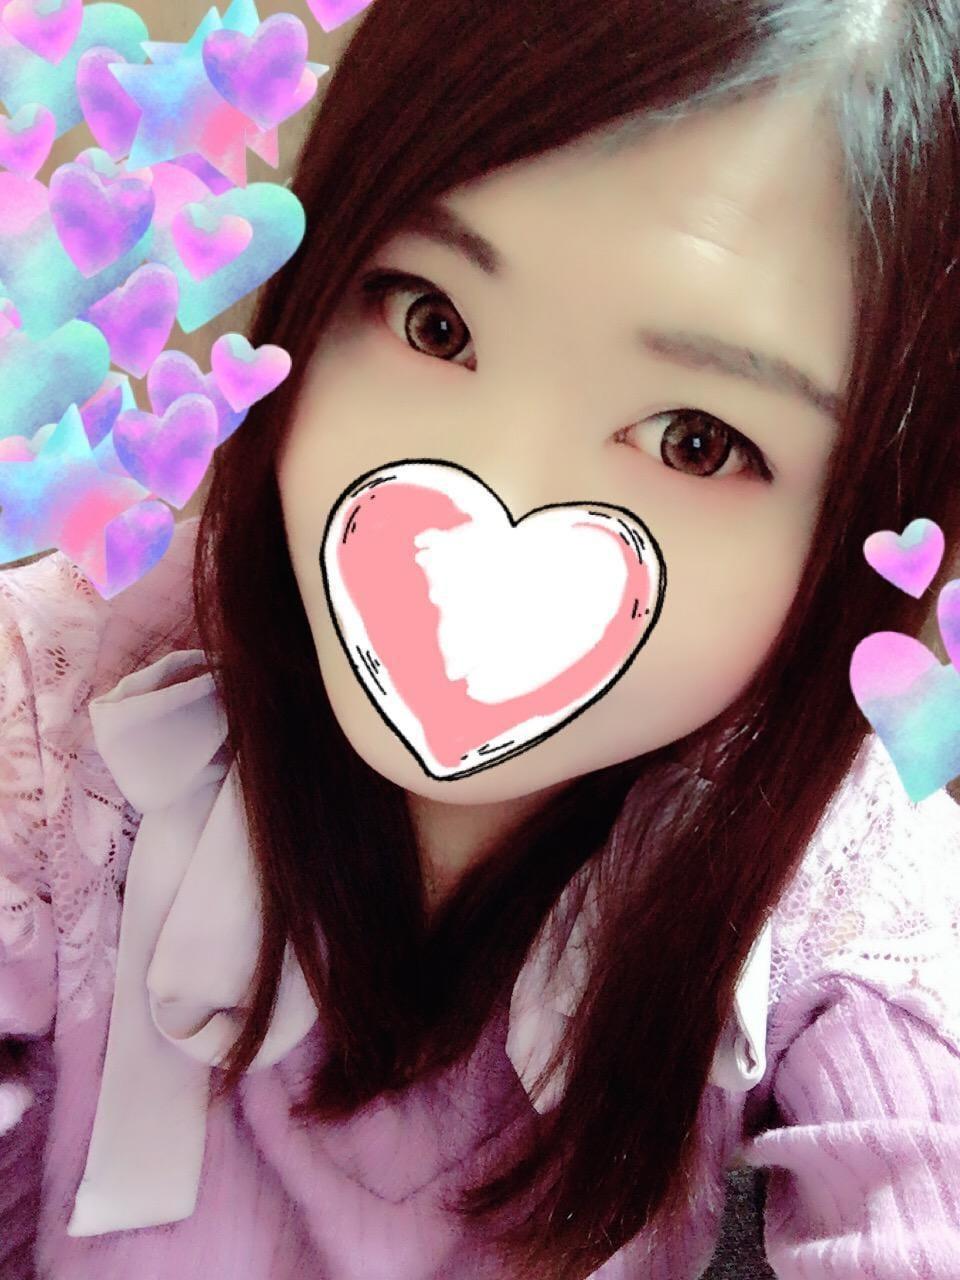 「January 16th ☆」01/16(01/16) 18:01 | まどかの写メ・風俗動画